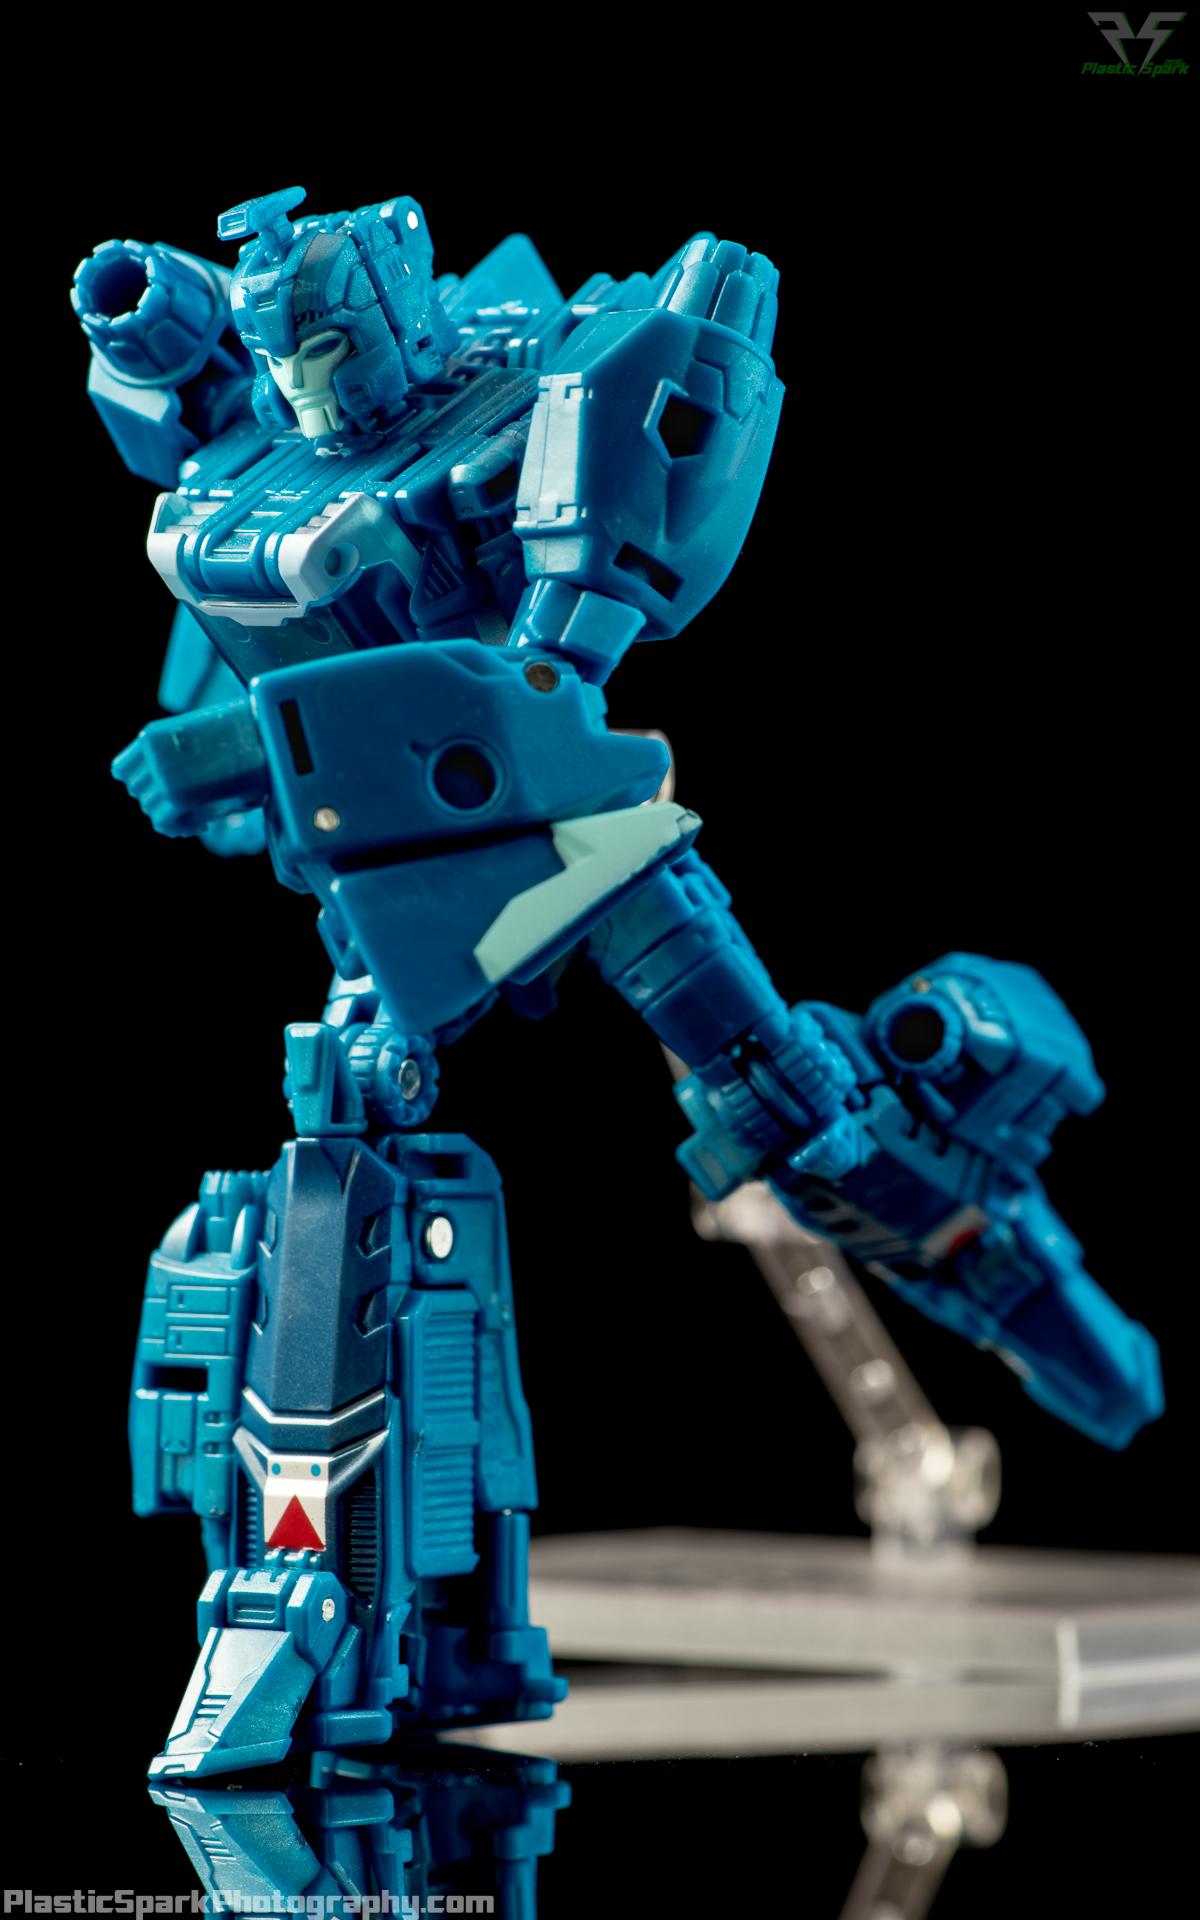 Titans-Return-Blurr-(2-of-6).png